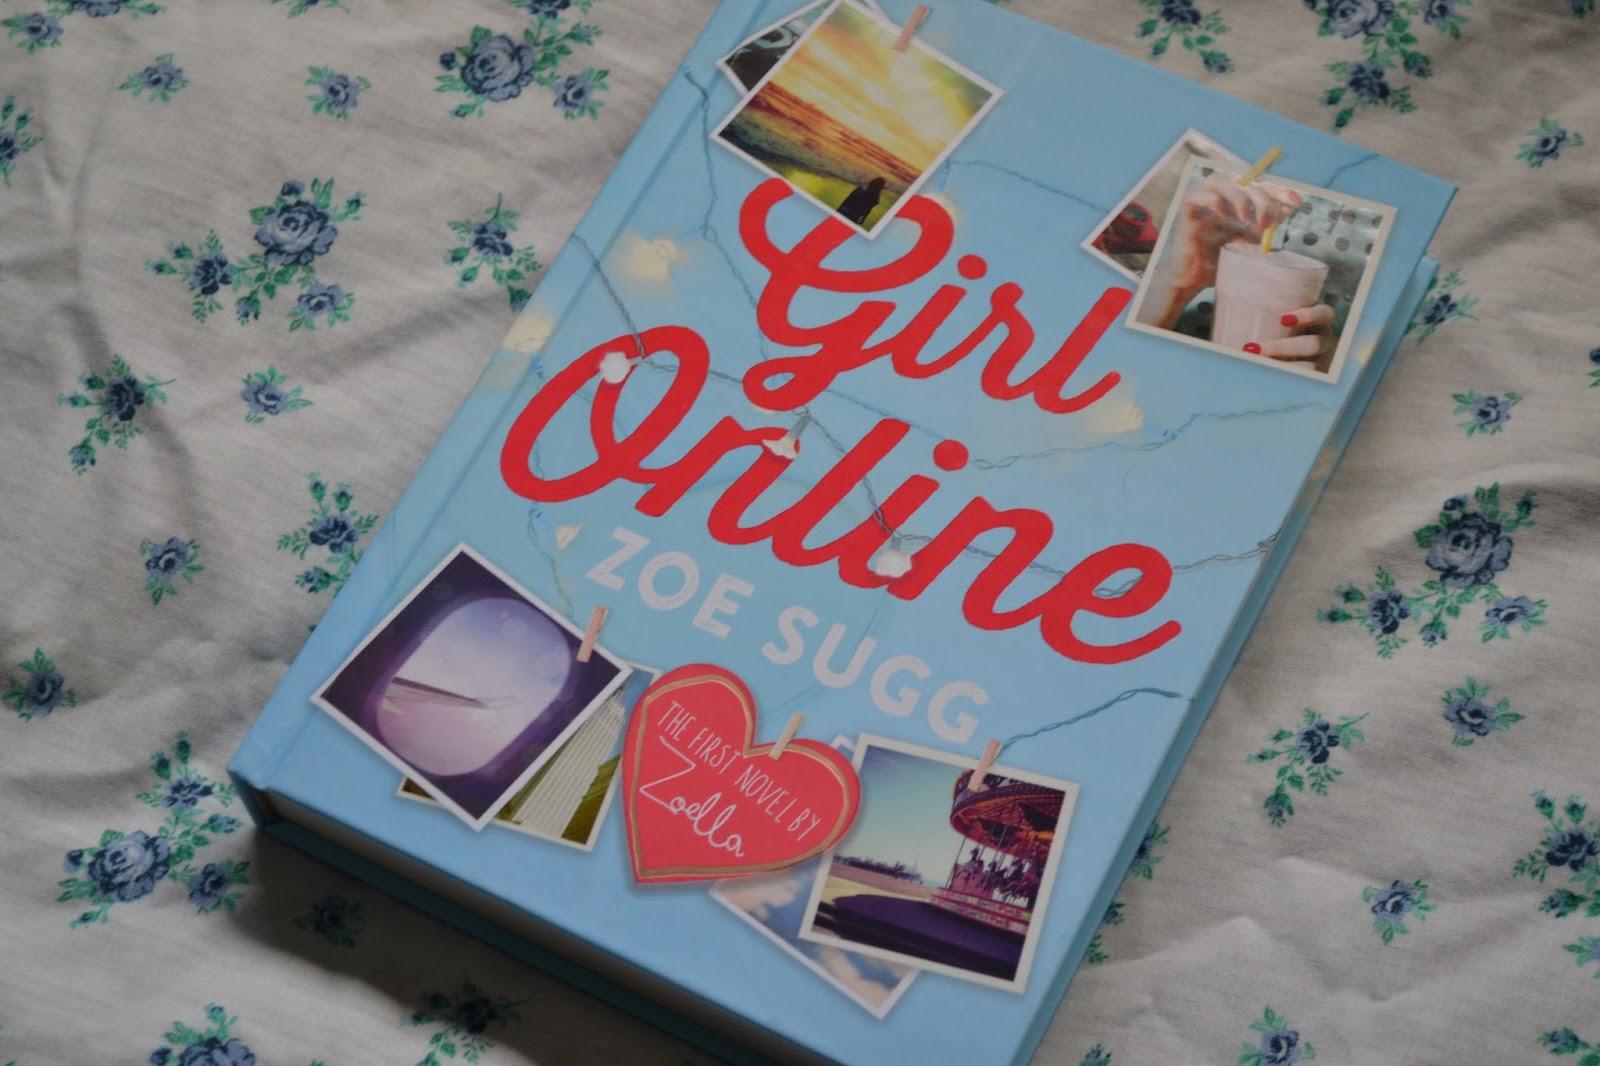 Zoella Zoe Sugg Girl Online Book Review